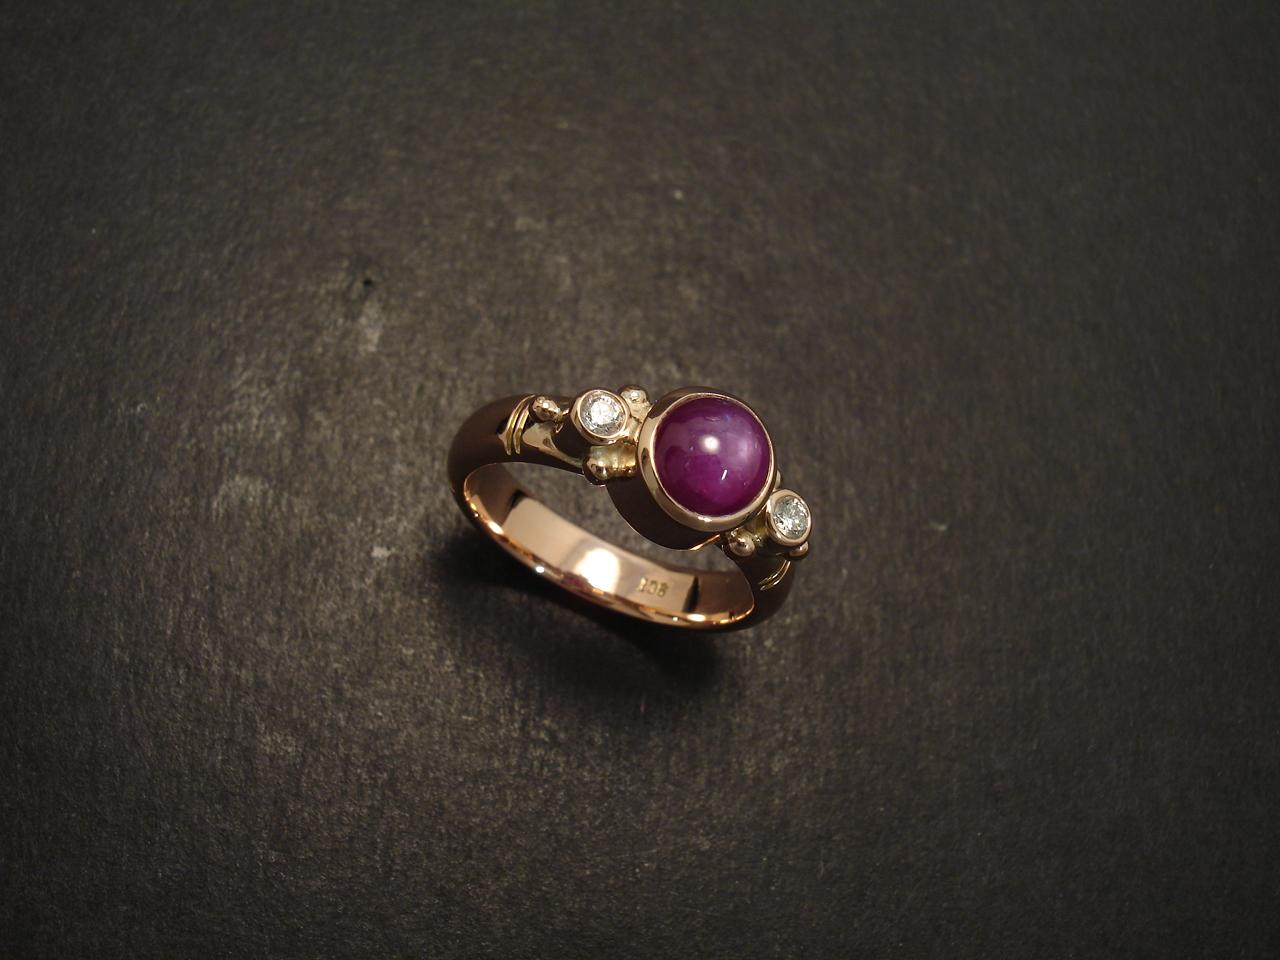 Antique Ruby Rings Australia